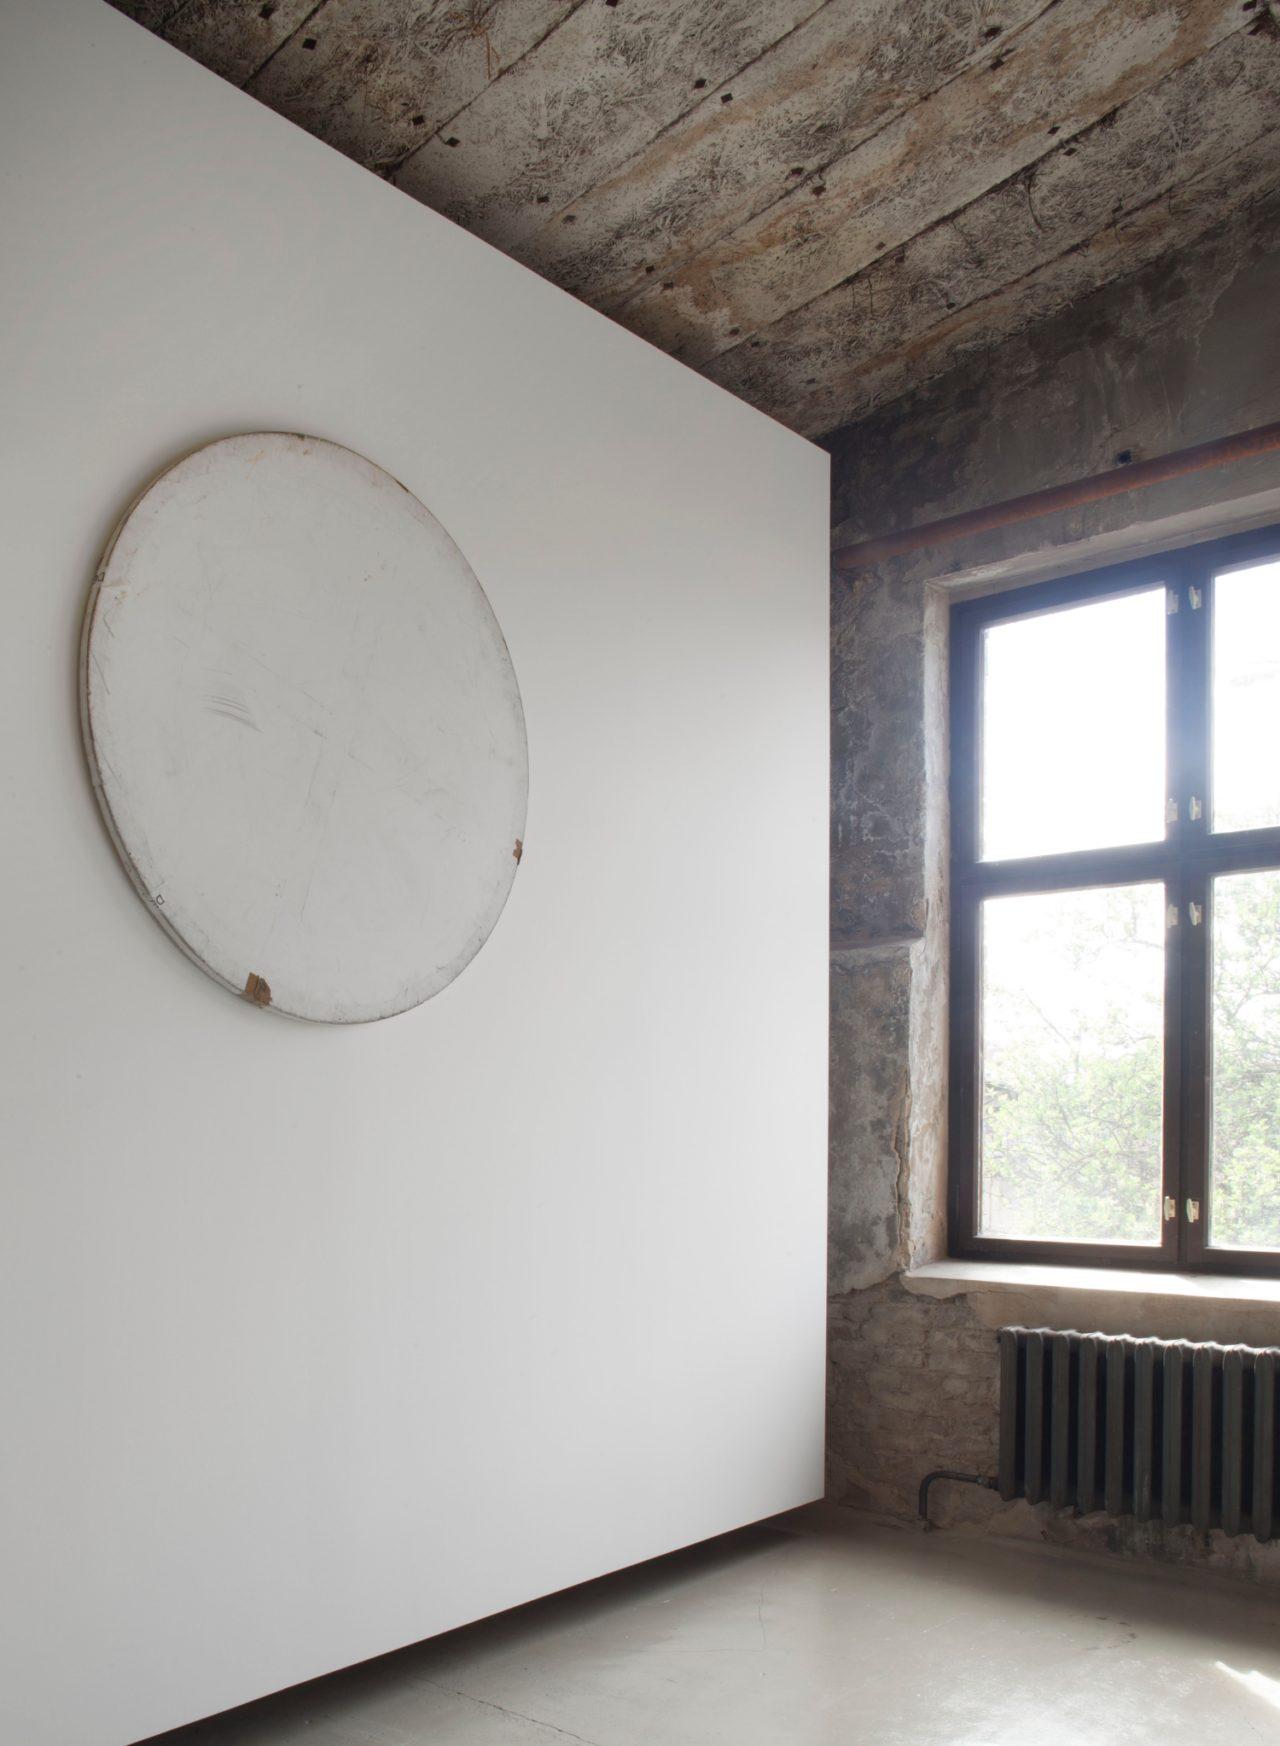 Karin Sander, Mailed Painting 109 (Bonn – Düsseldorf – Berlin – Dresden – Berlin) (2010)